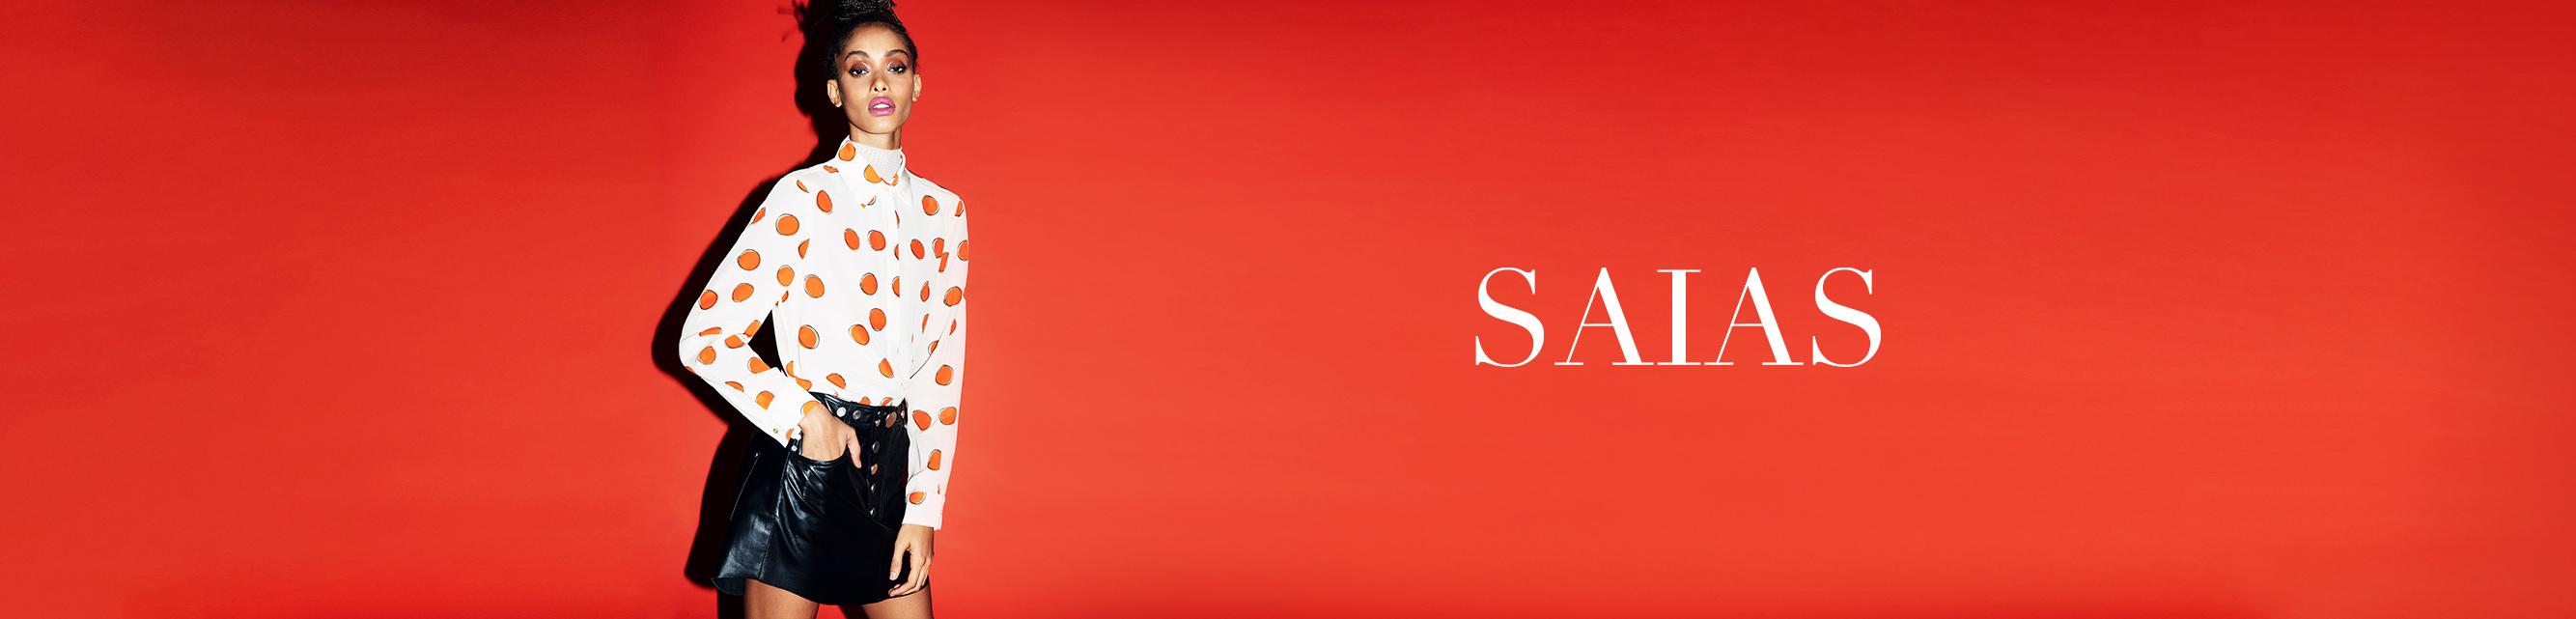 Banner Saias